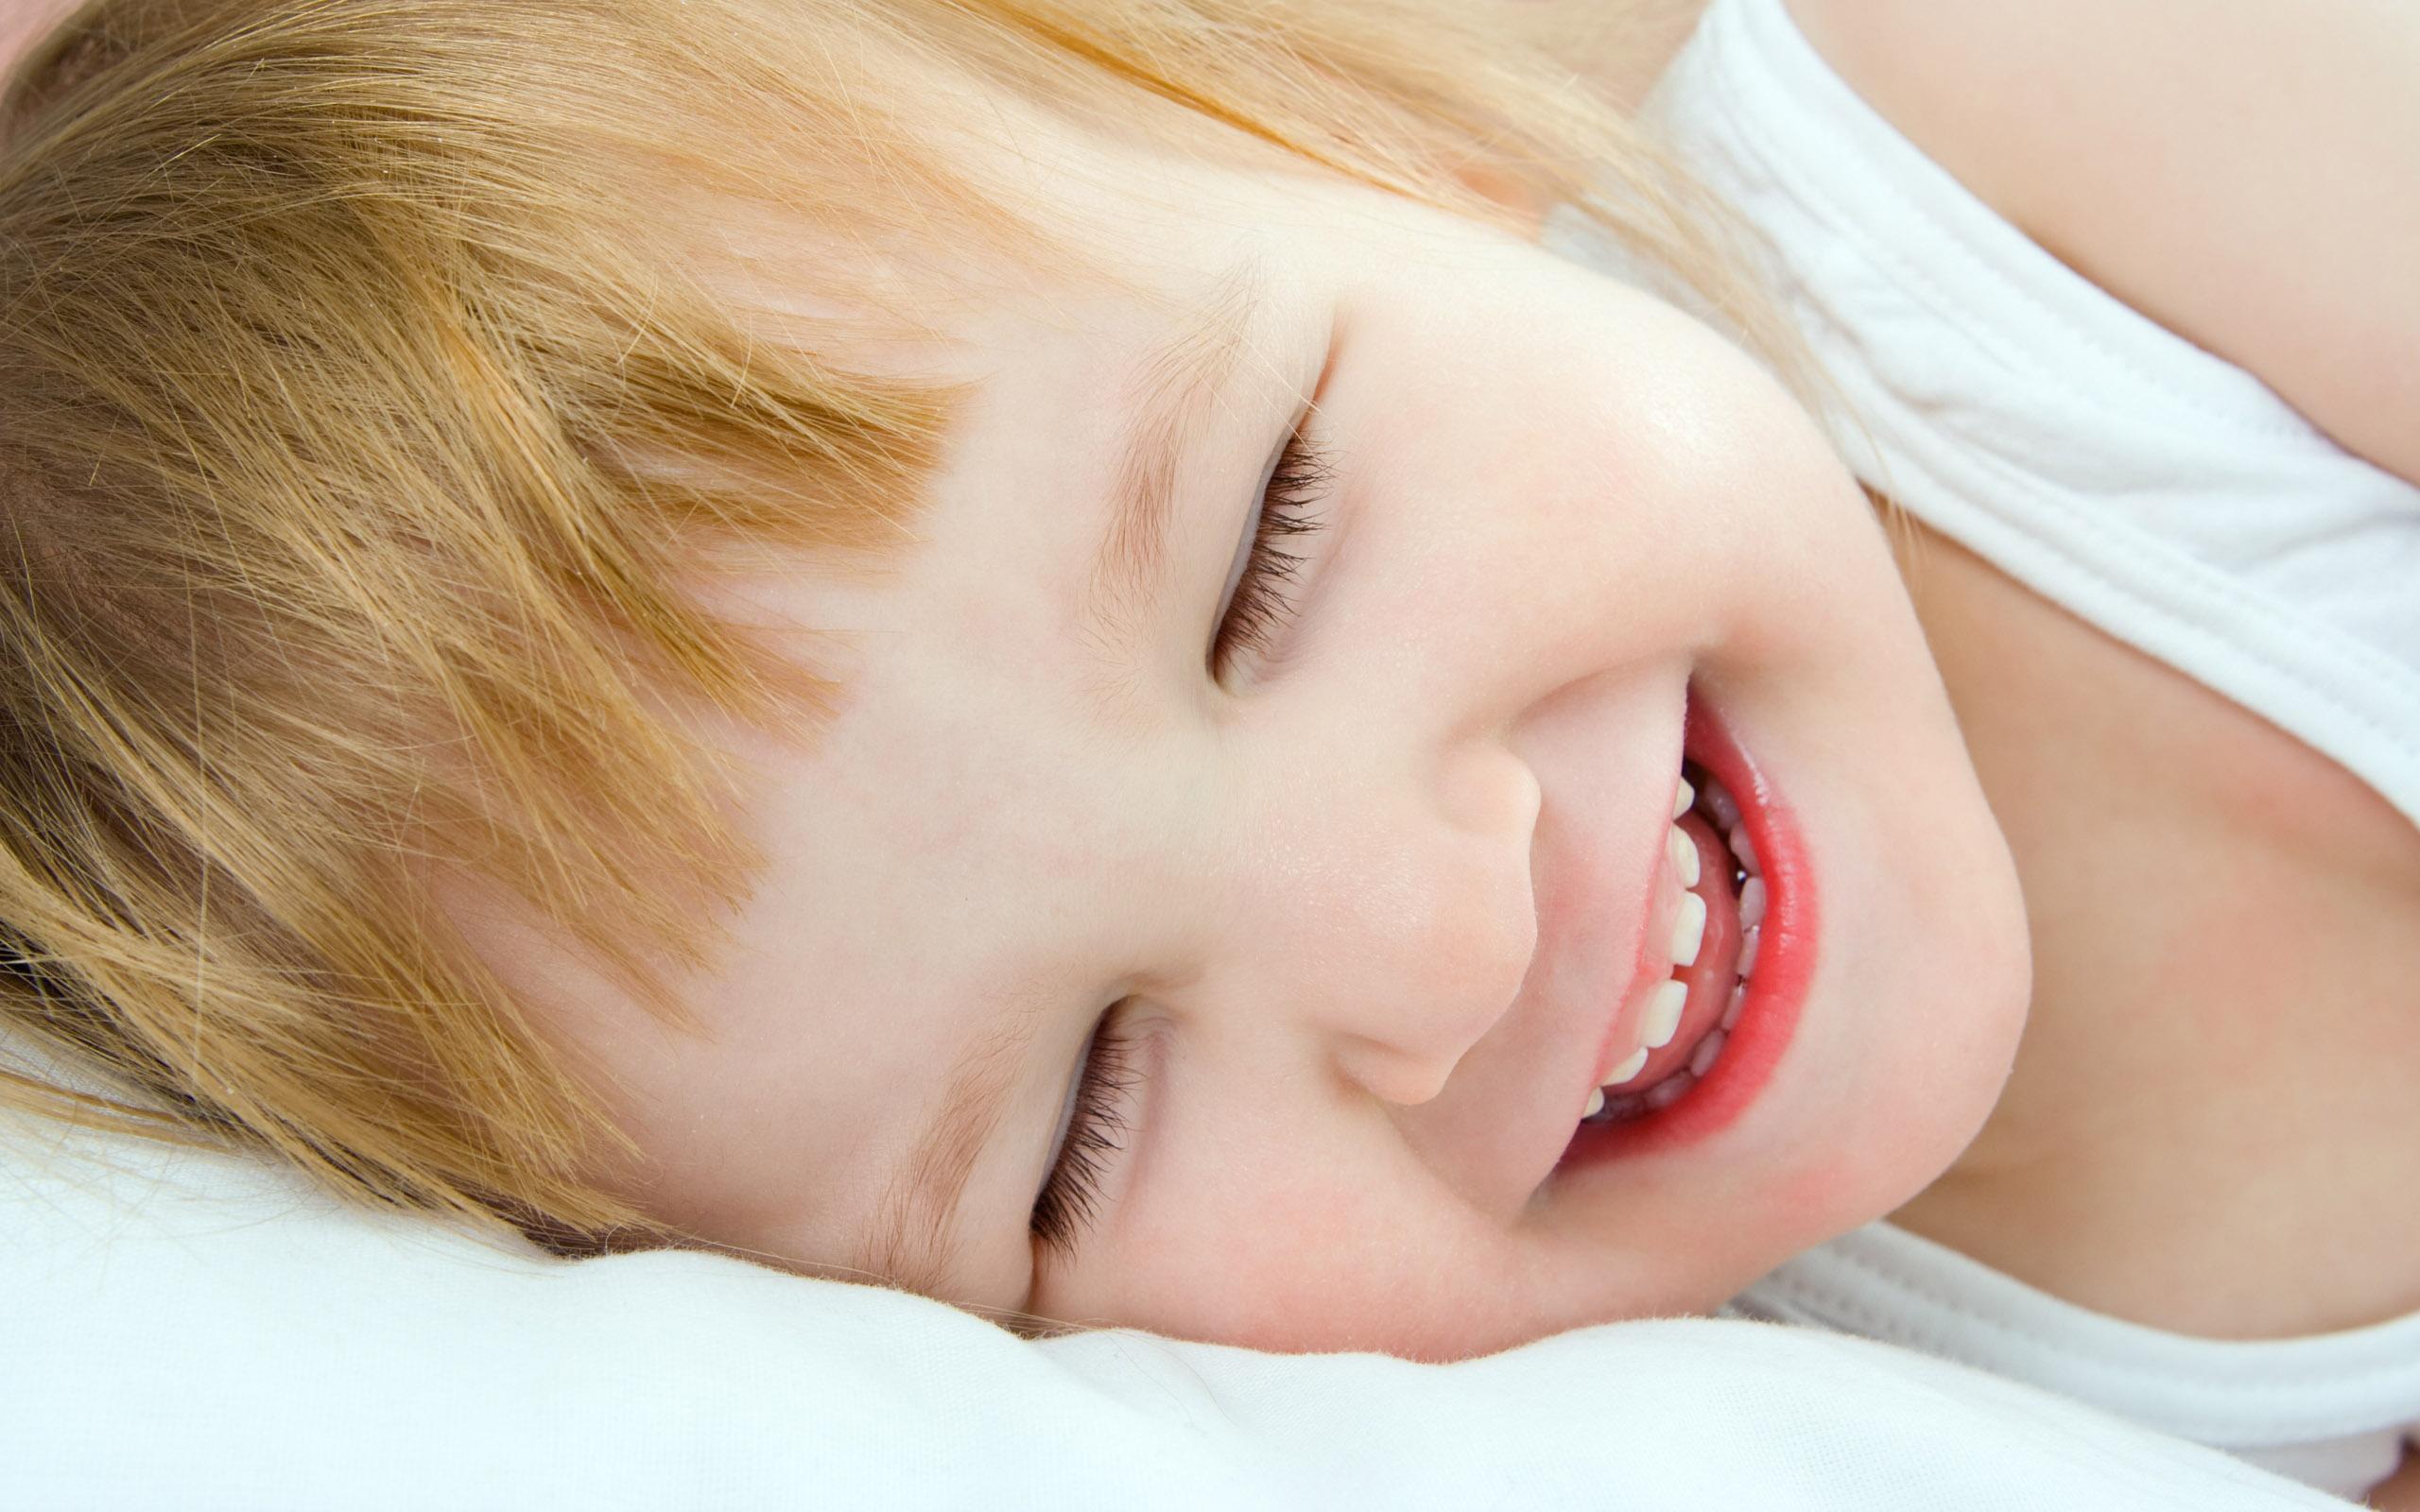 Una dulce sonrisa